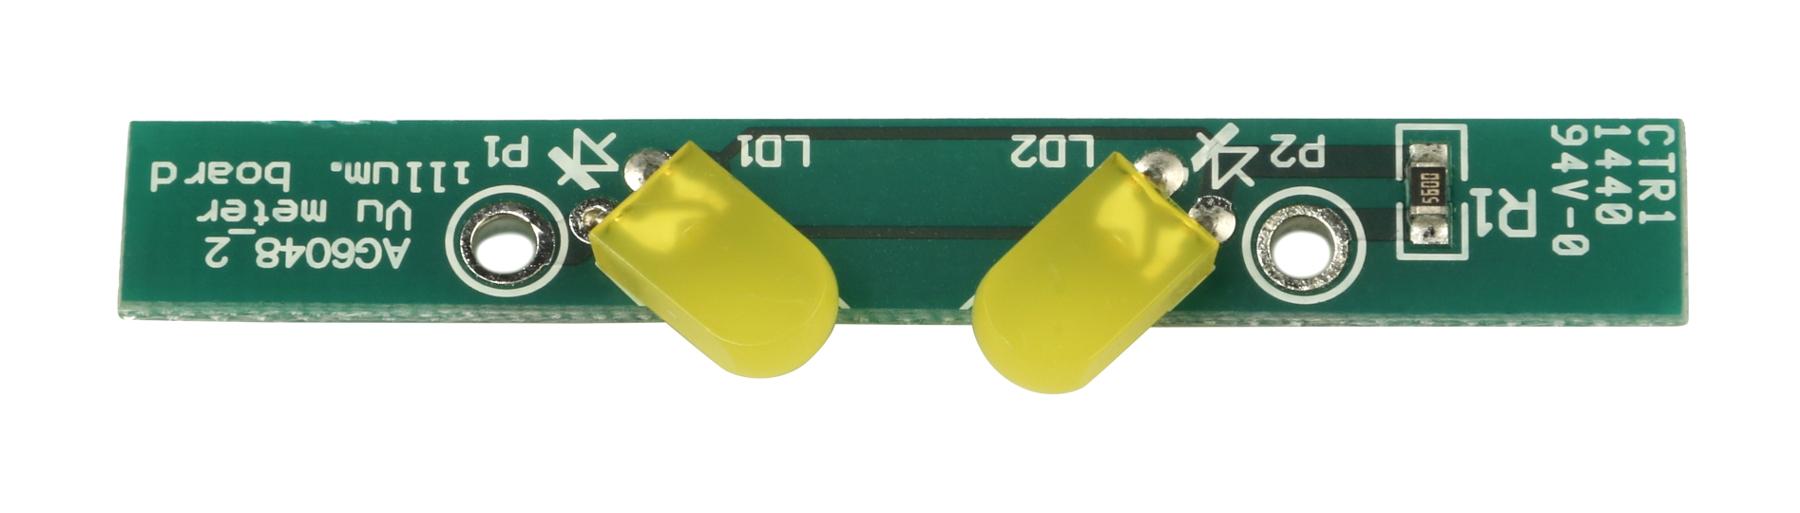 Allen & Heath 003-390JIT LED Meter Kit for GL and ML Series 003-390JIT